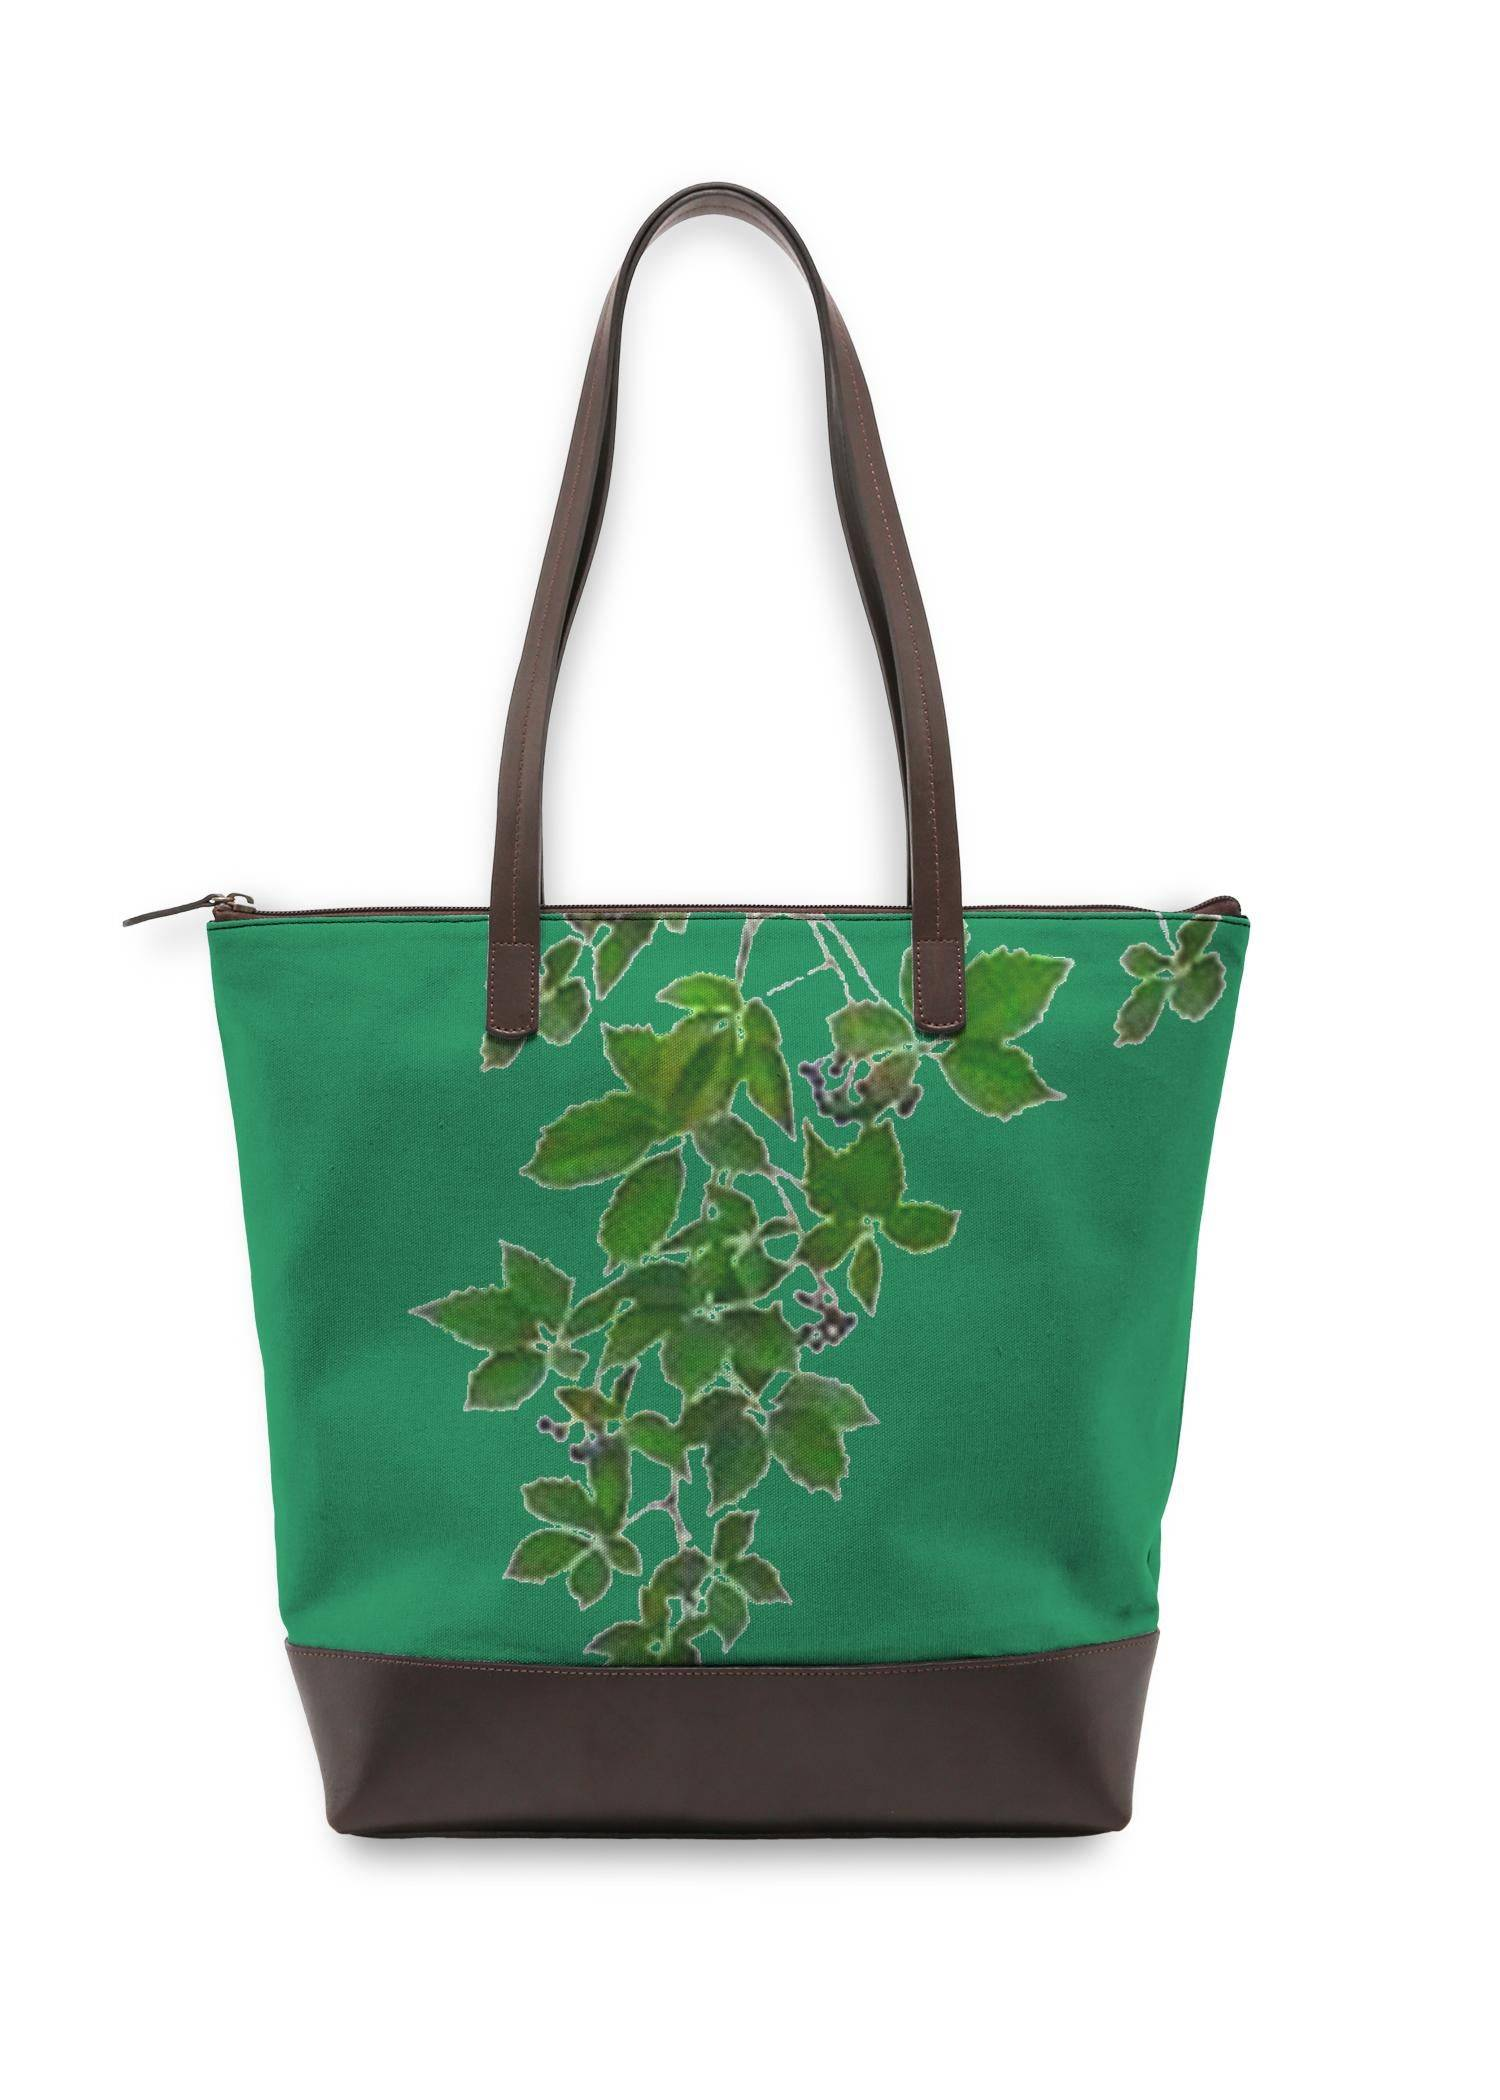 VIDA Statement Bag - Green Hanging Home Decor by VIDA Original Artist  - Size: One Size